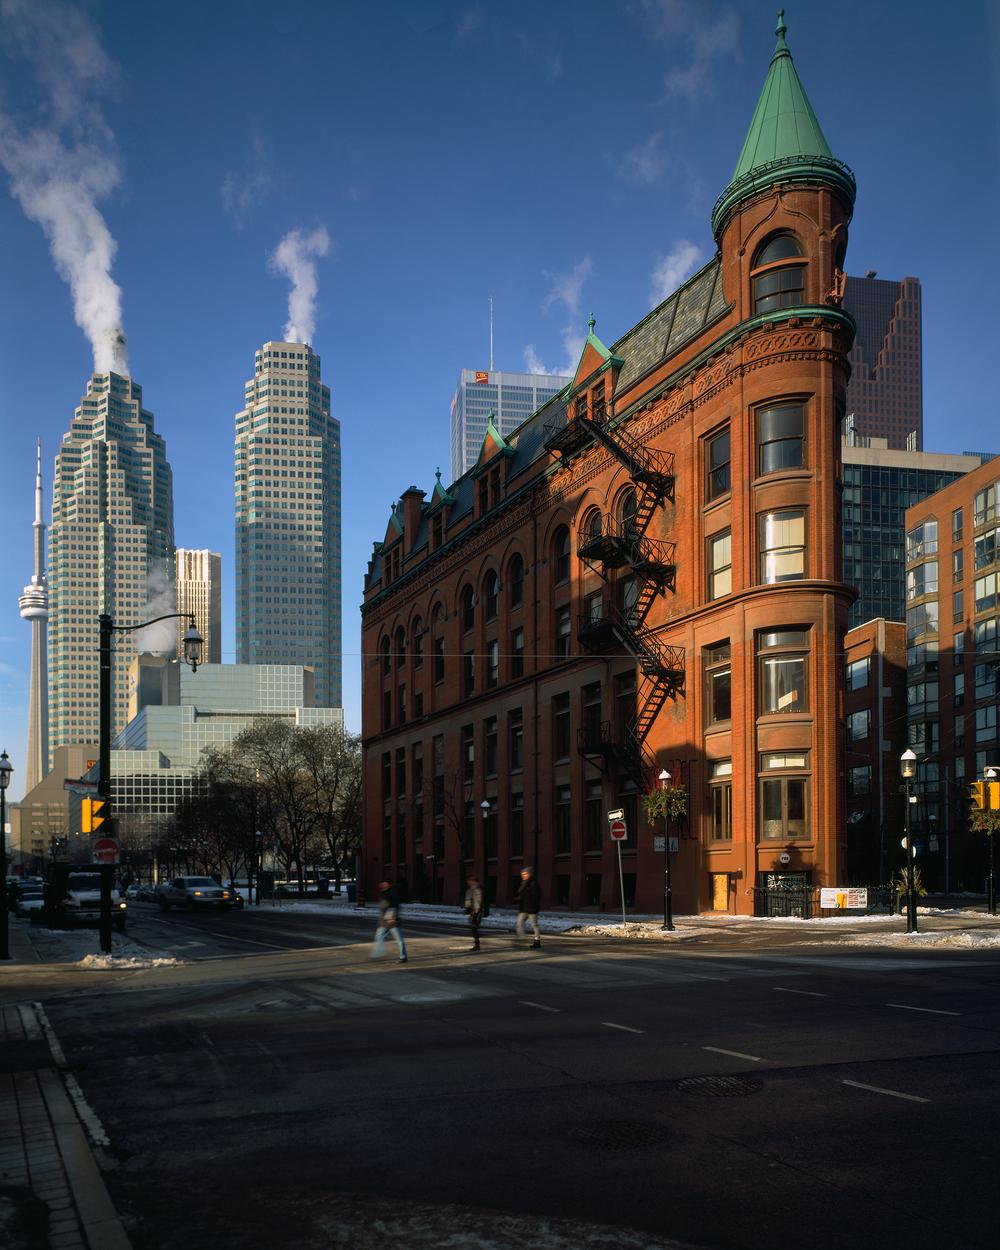 Gooderham Building, Toronto (1892)